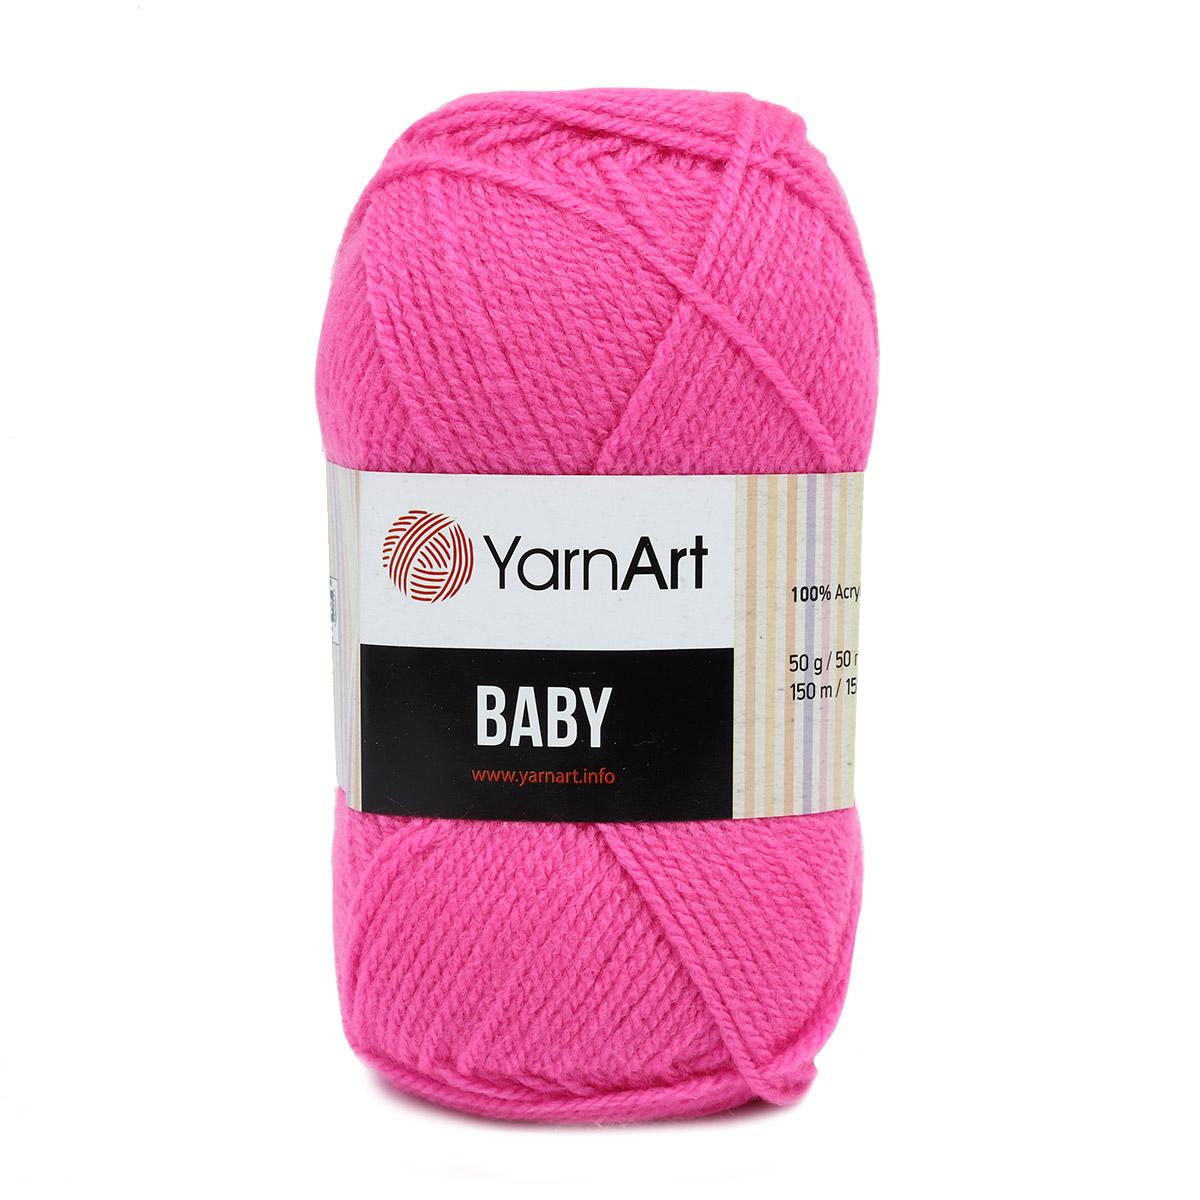 Пряжа YarnArt 'Baby' 50гр. 150м (100%акрил) (174 мальва) фото